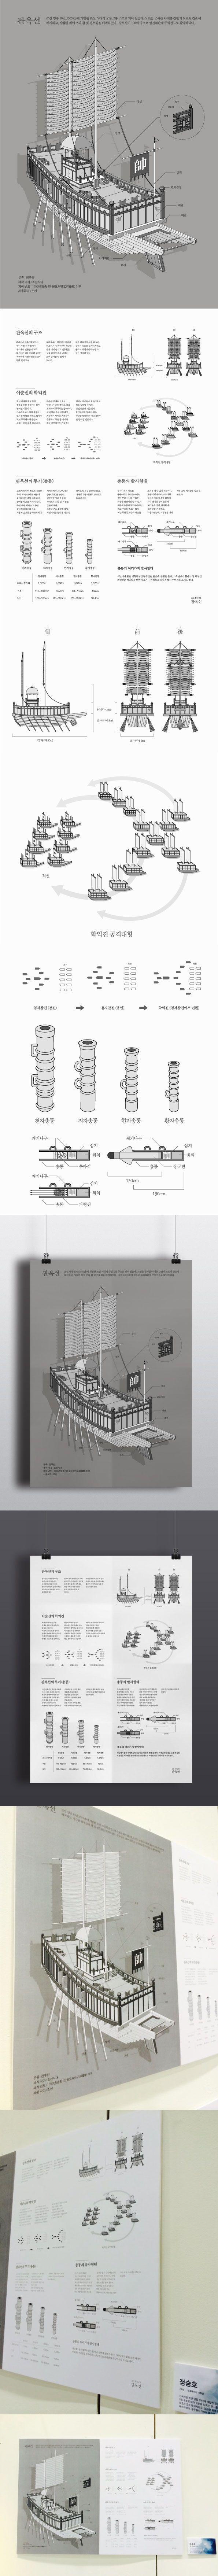 Jung seung ho│ Information Design 2015│ Major in Digital Media Design │#hicoda │hicoda.hongik.ac.kr